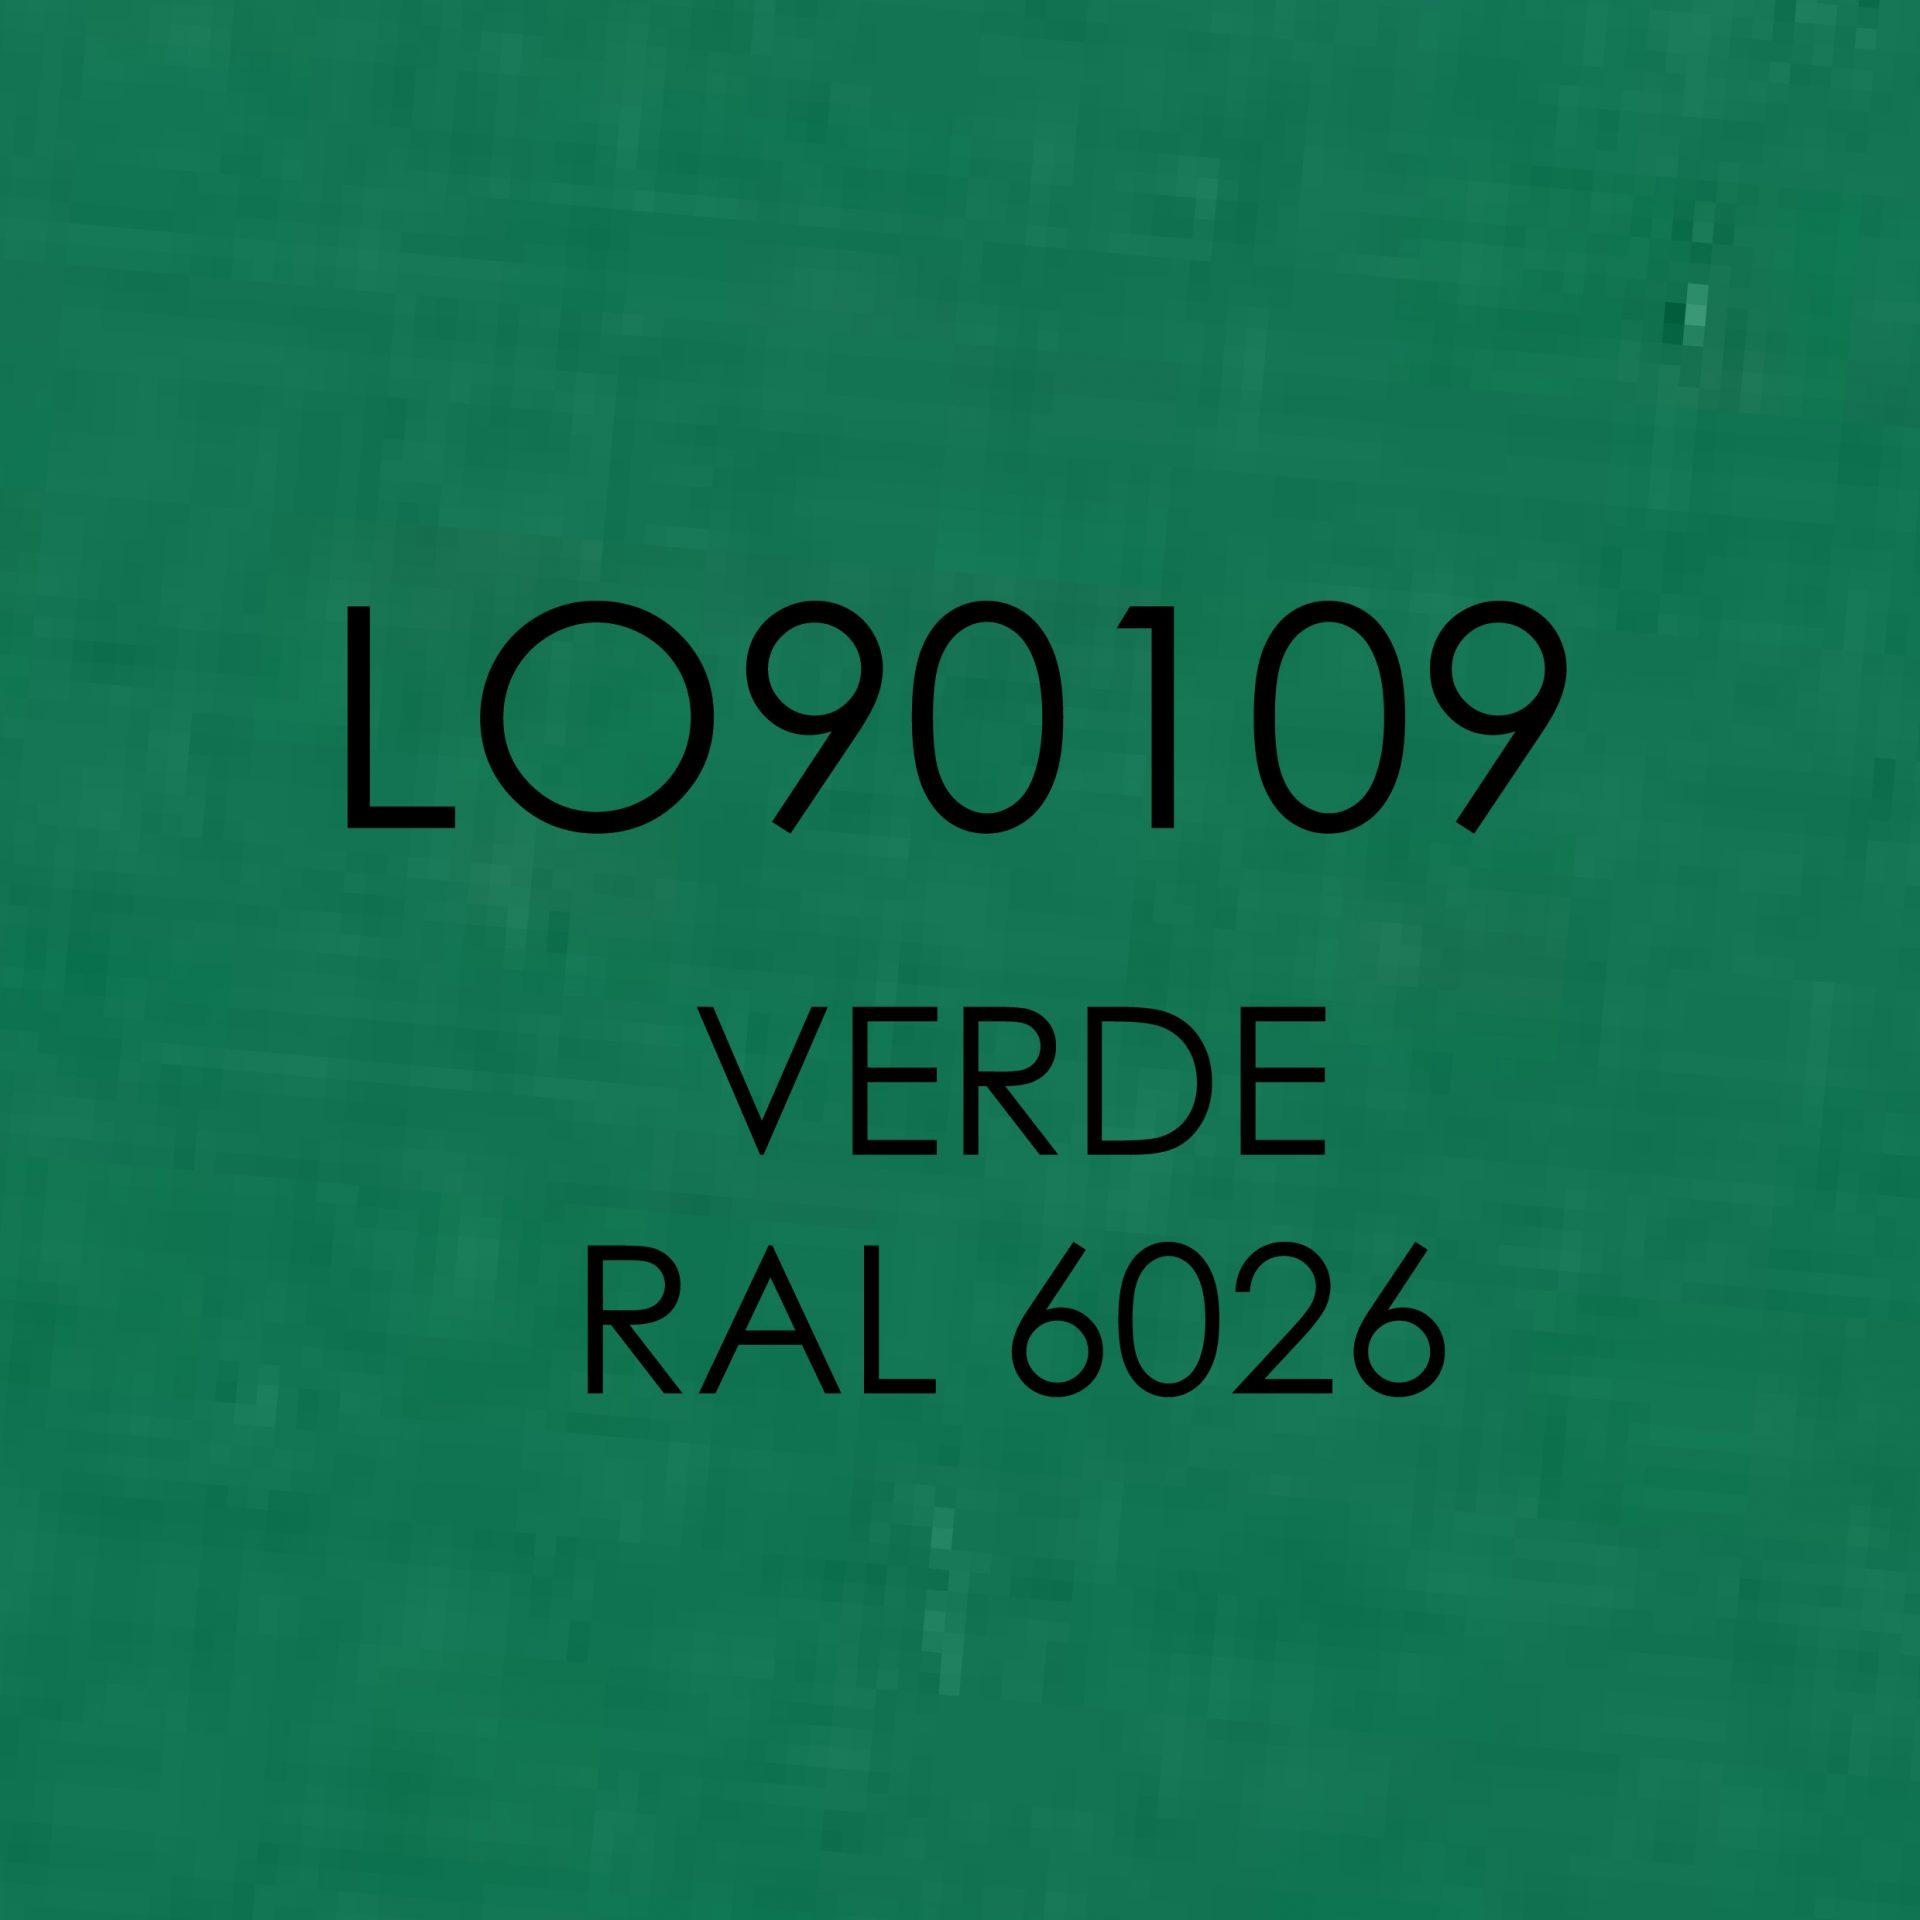 LO90109